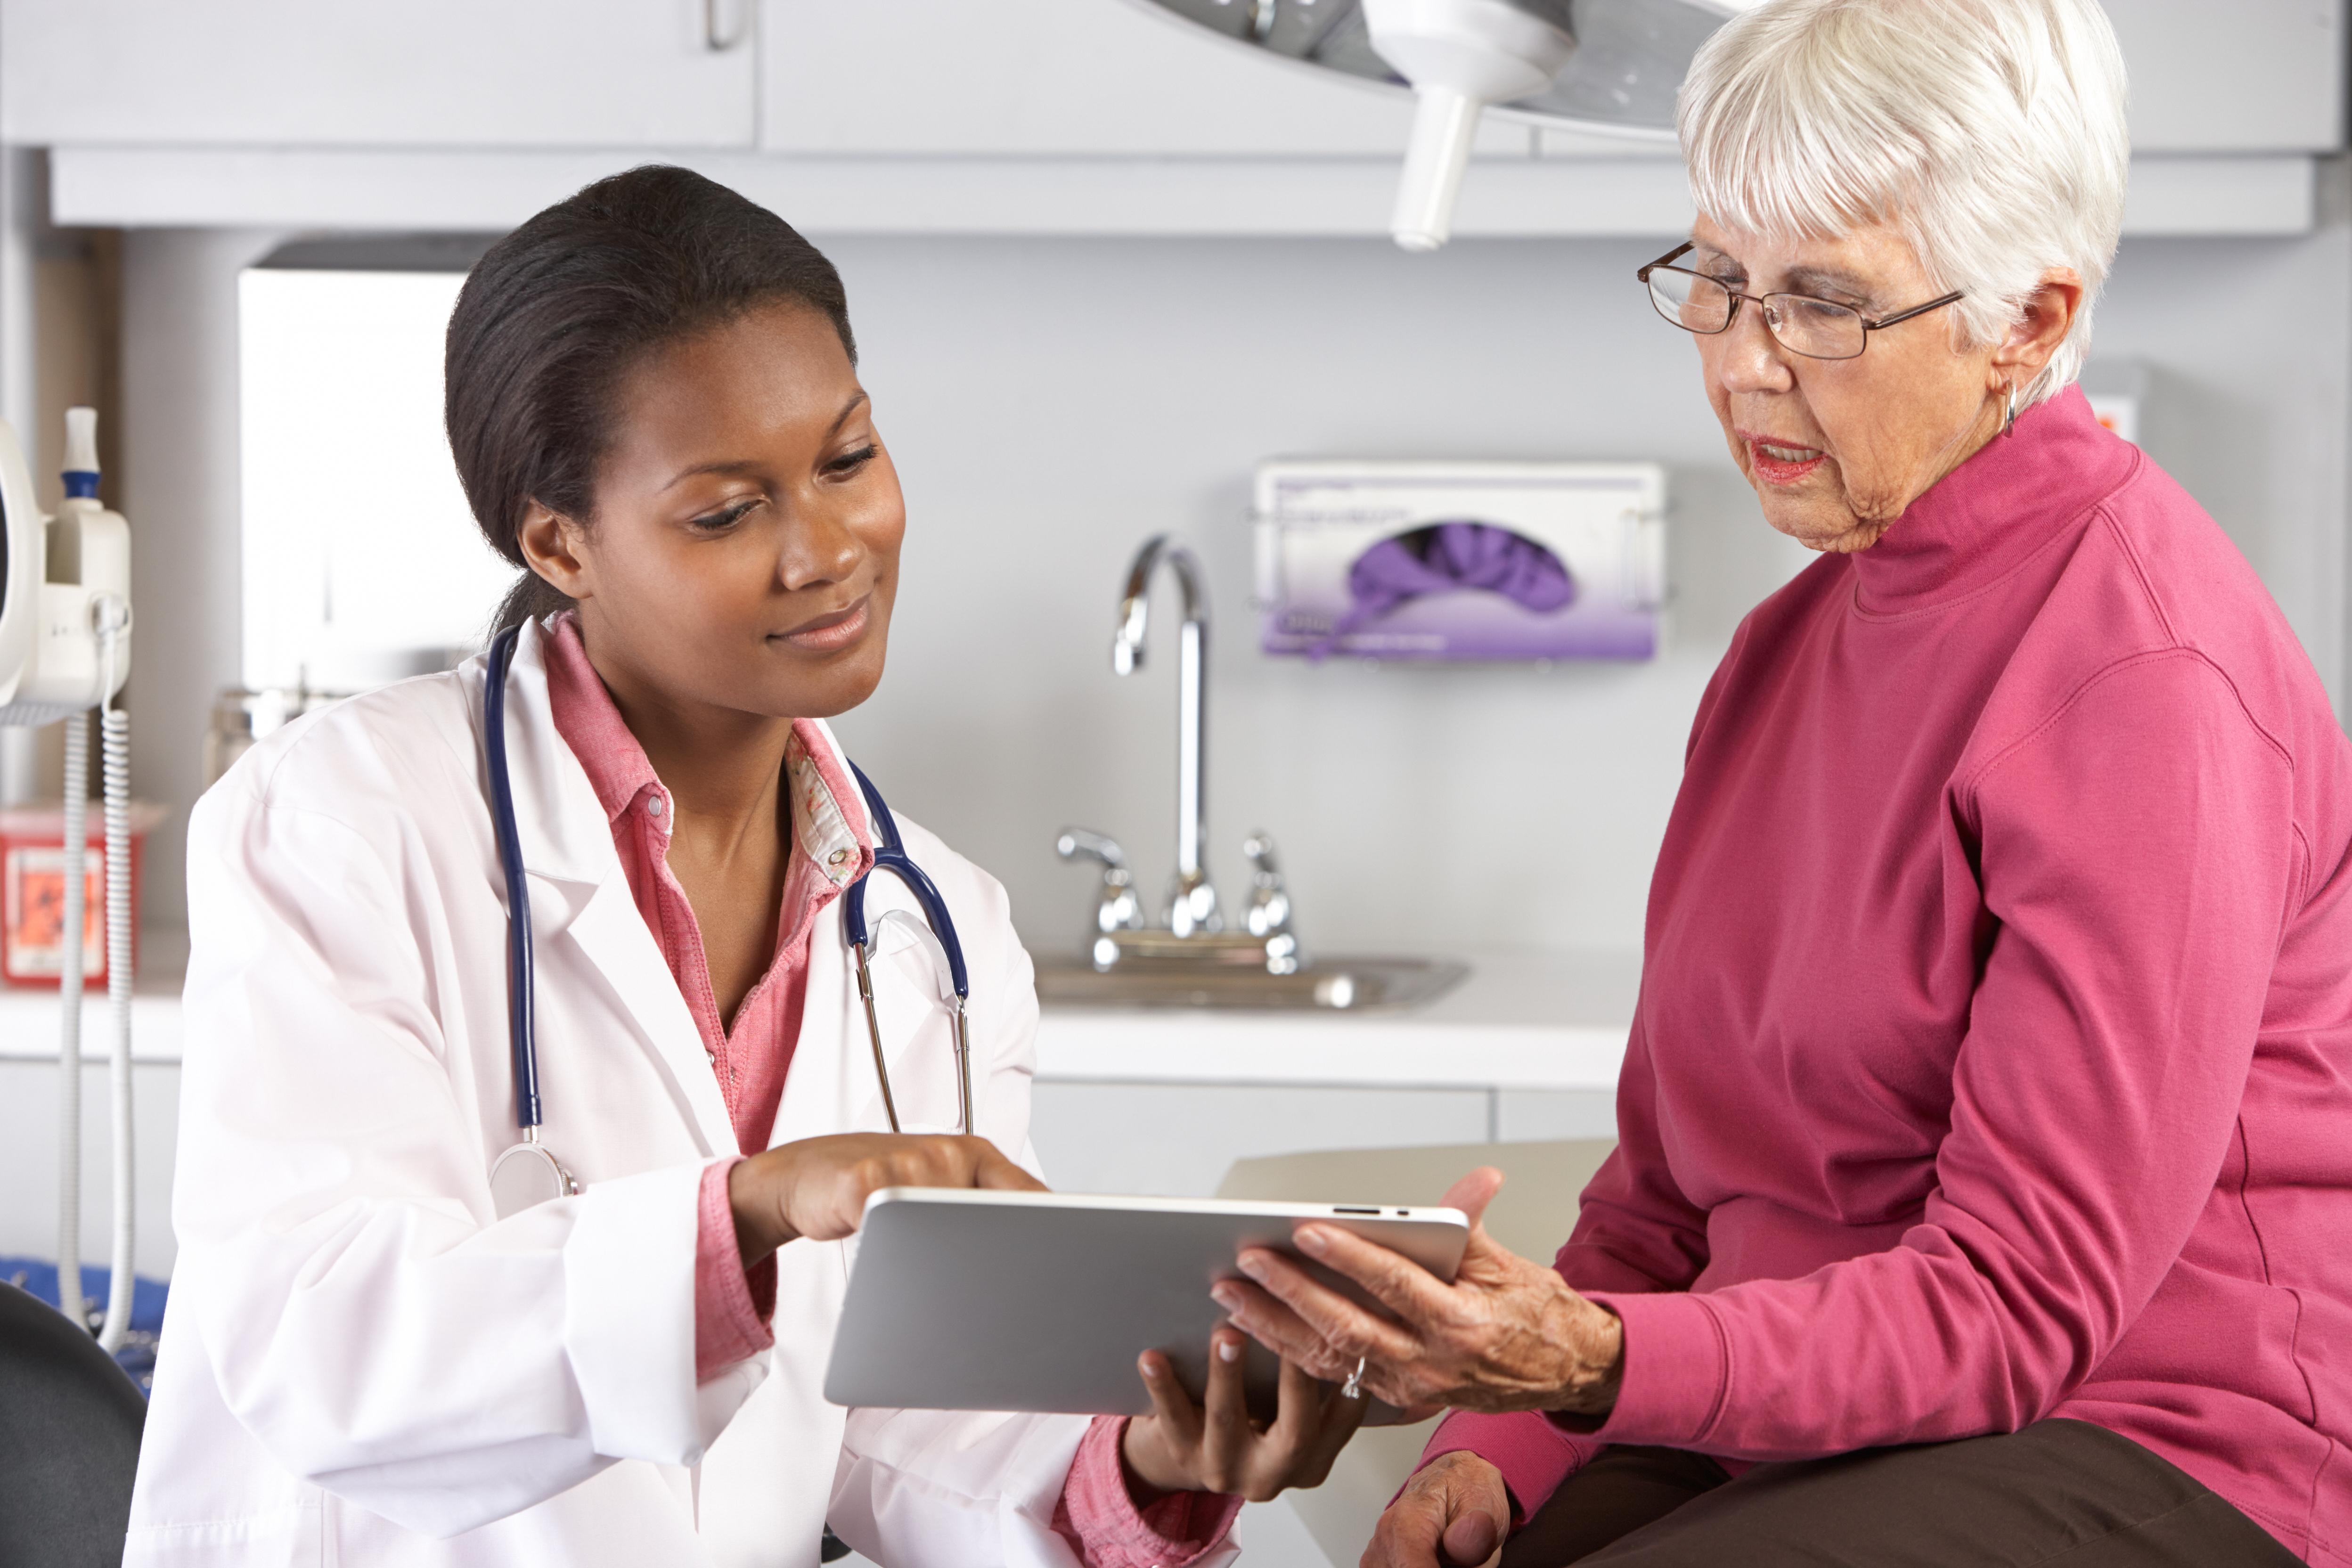 Life Expectancy Amp Prognosis For Idiopathic Pulmonary Fibrosis